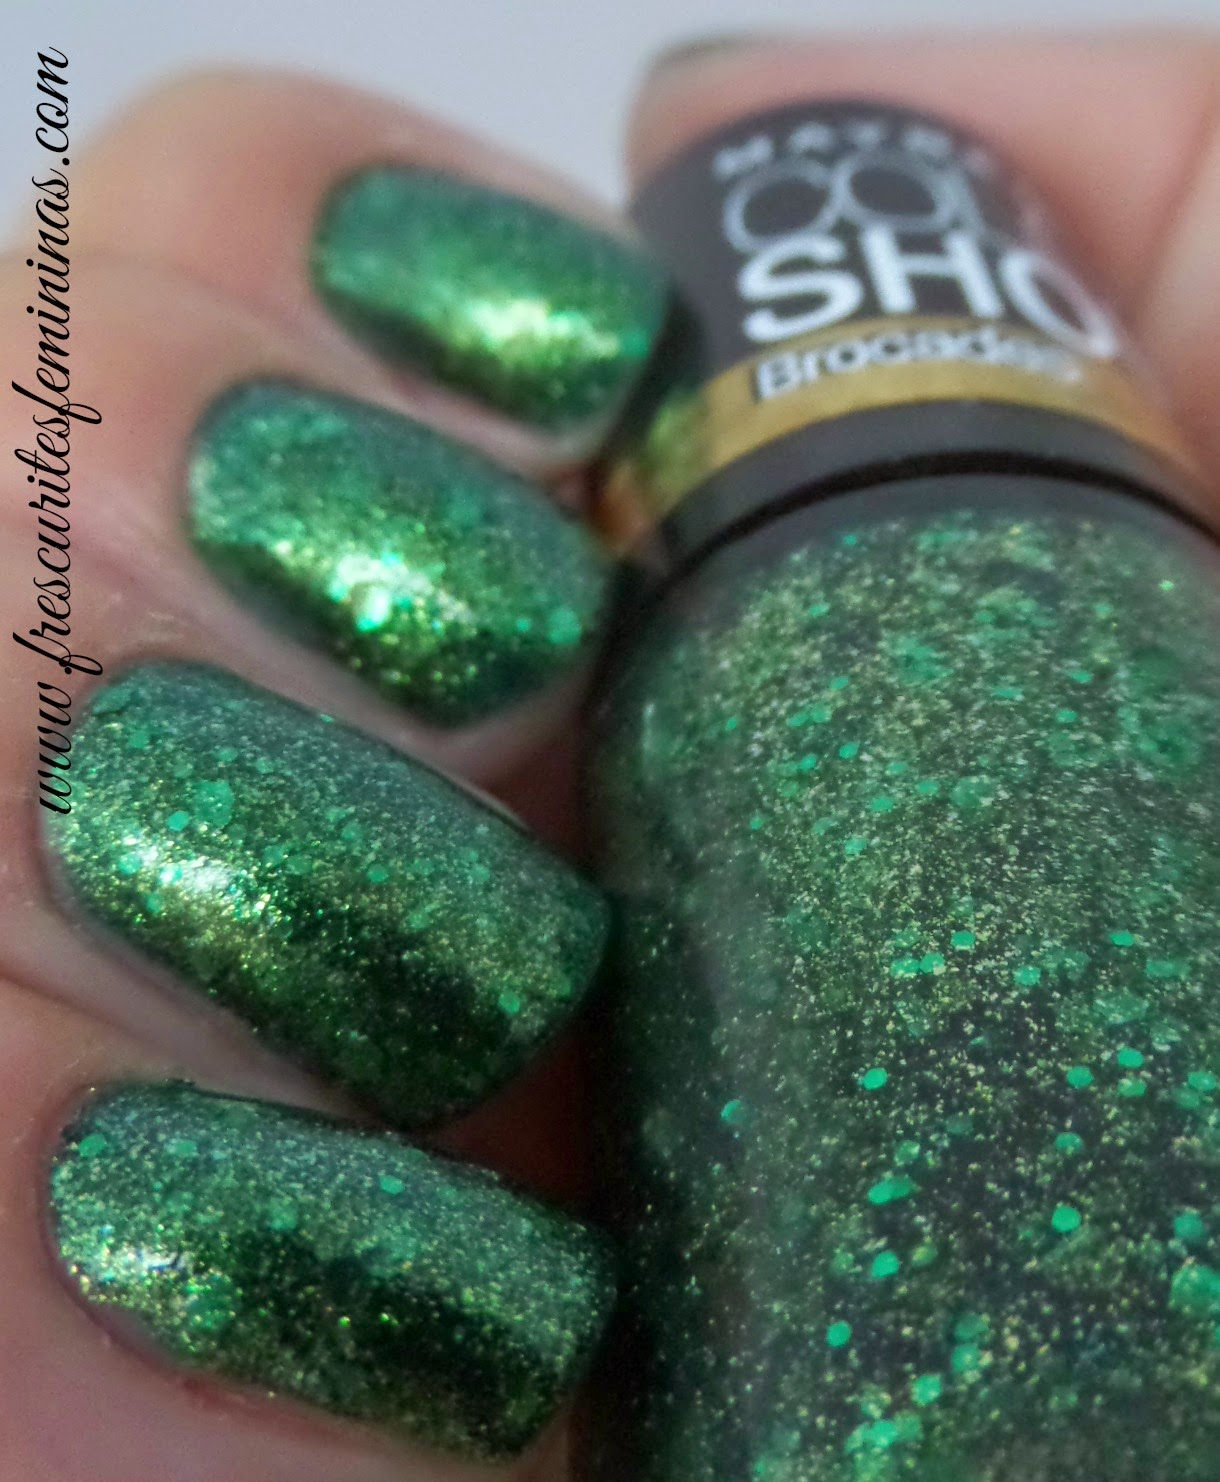 Maybelline, Emerald Elegance, Frescurites Femininas, Brocades